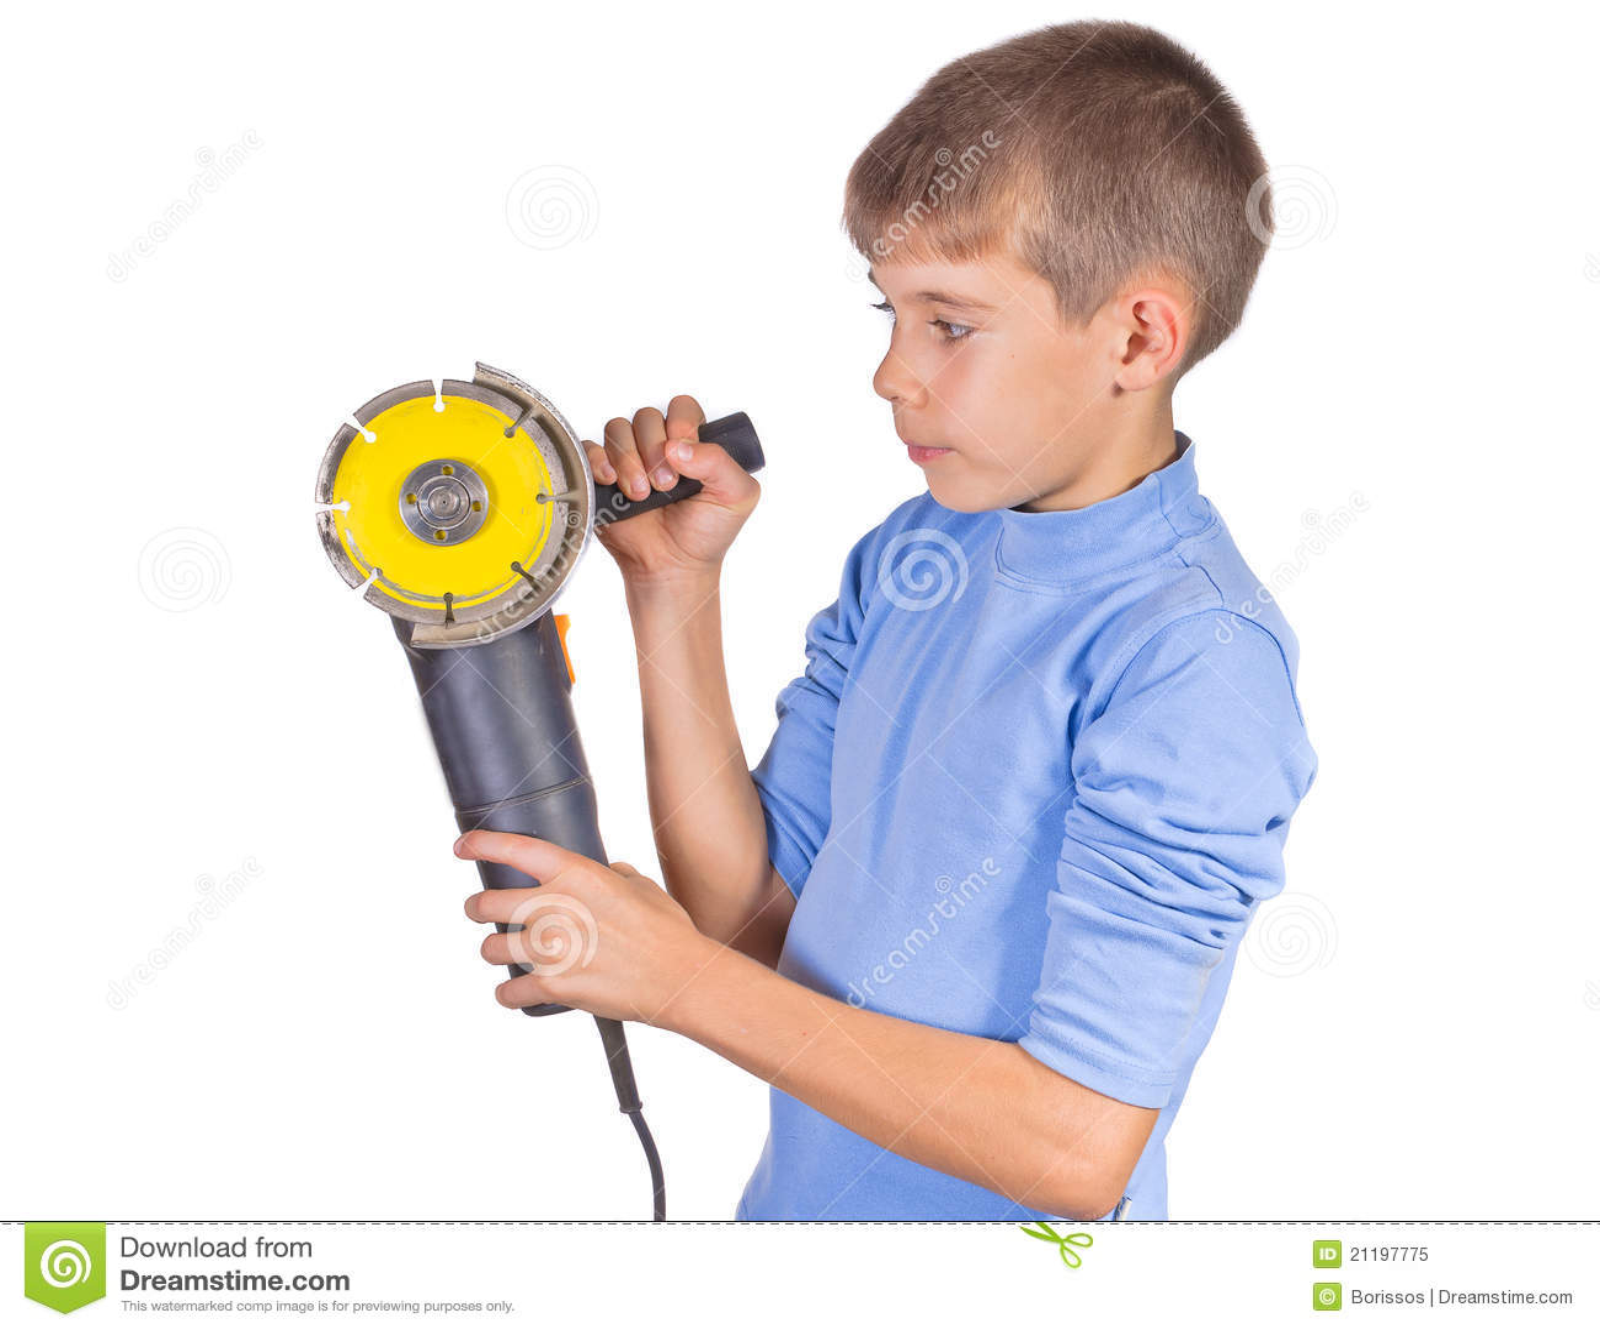 Boy with a grinder